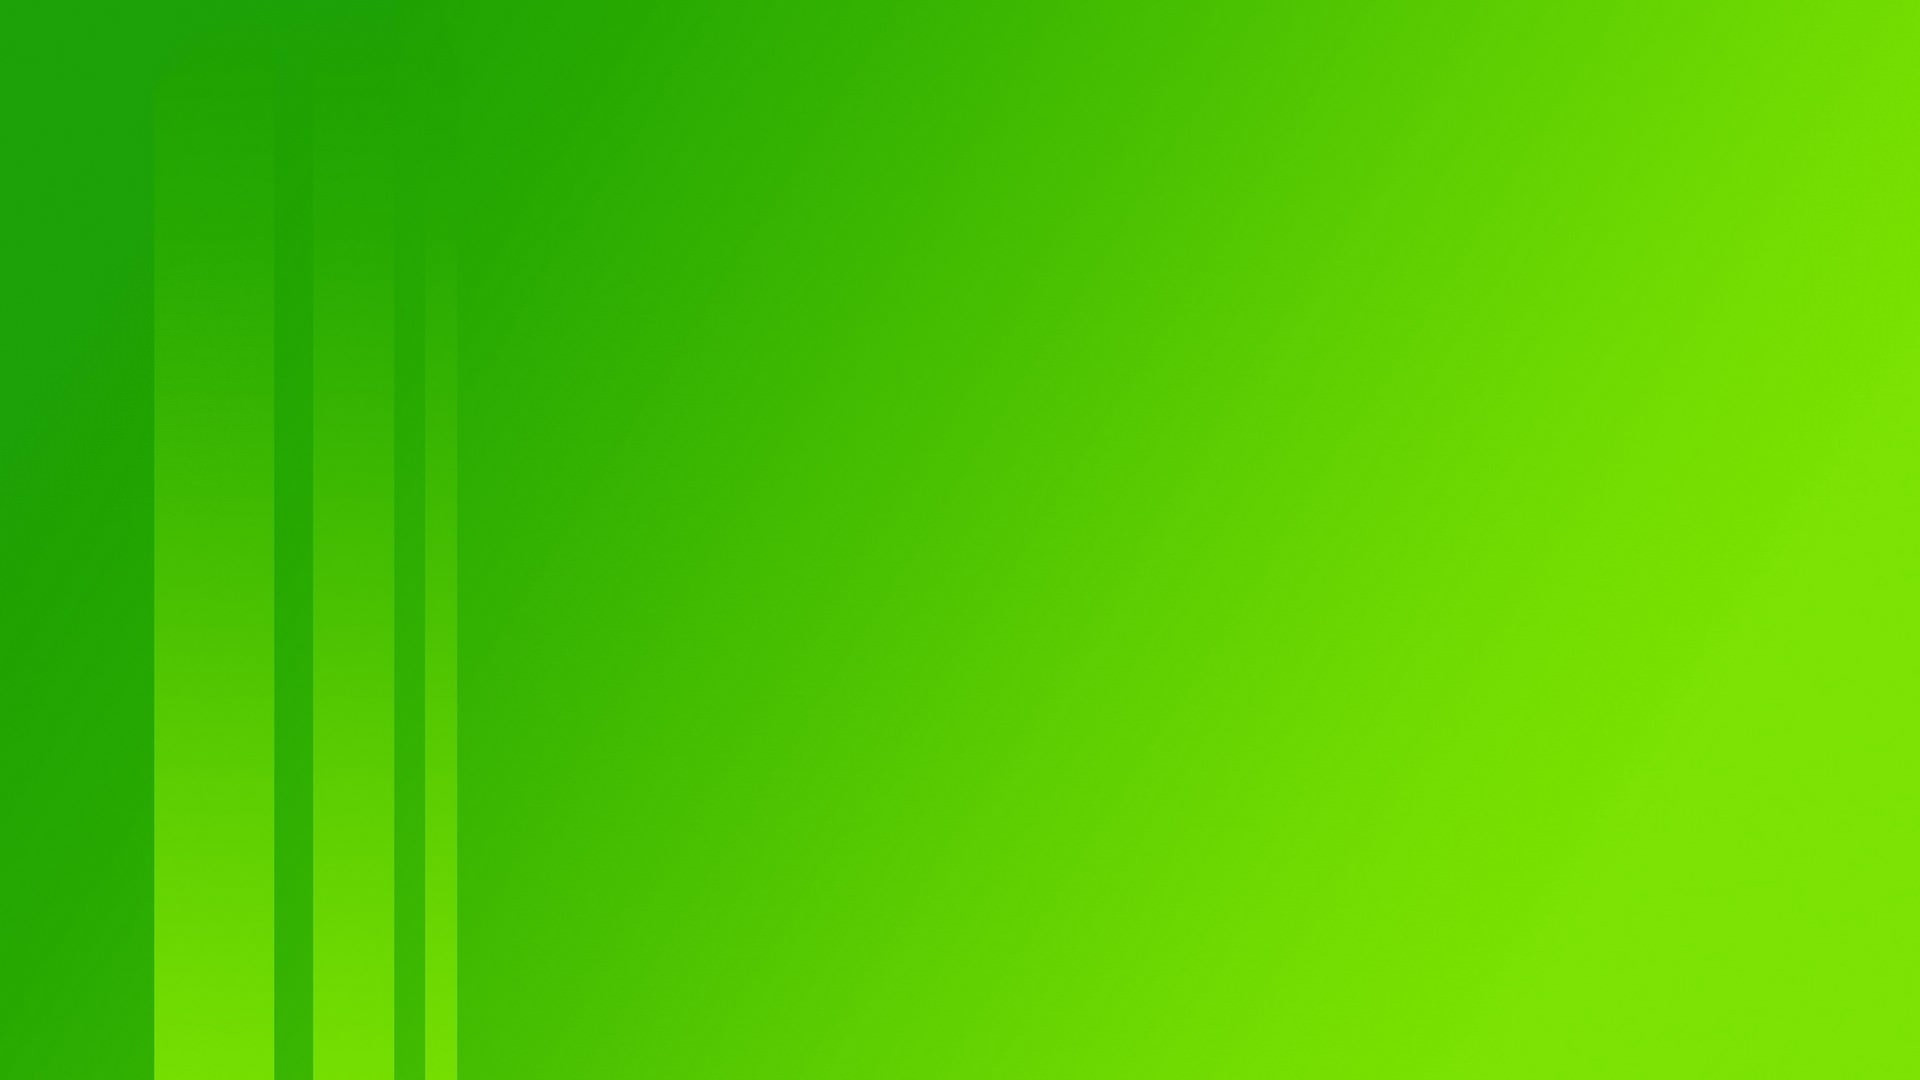 Green Color Background Wallpaper (56+ images)